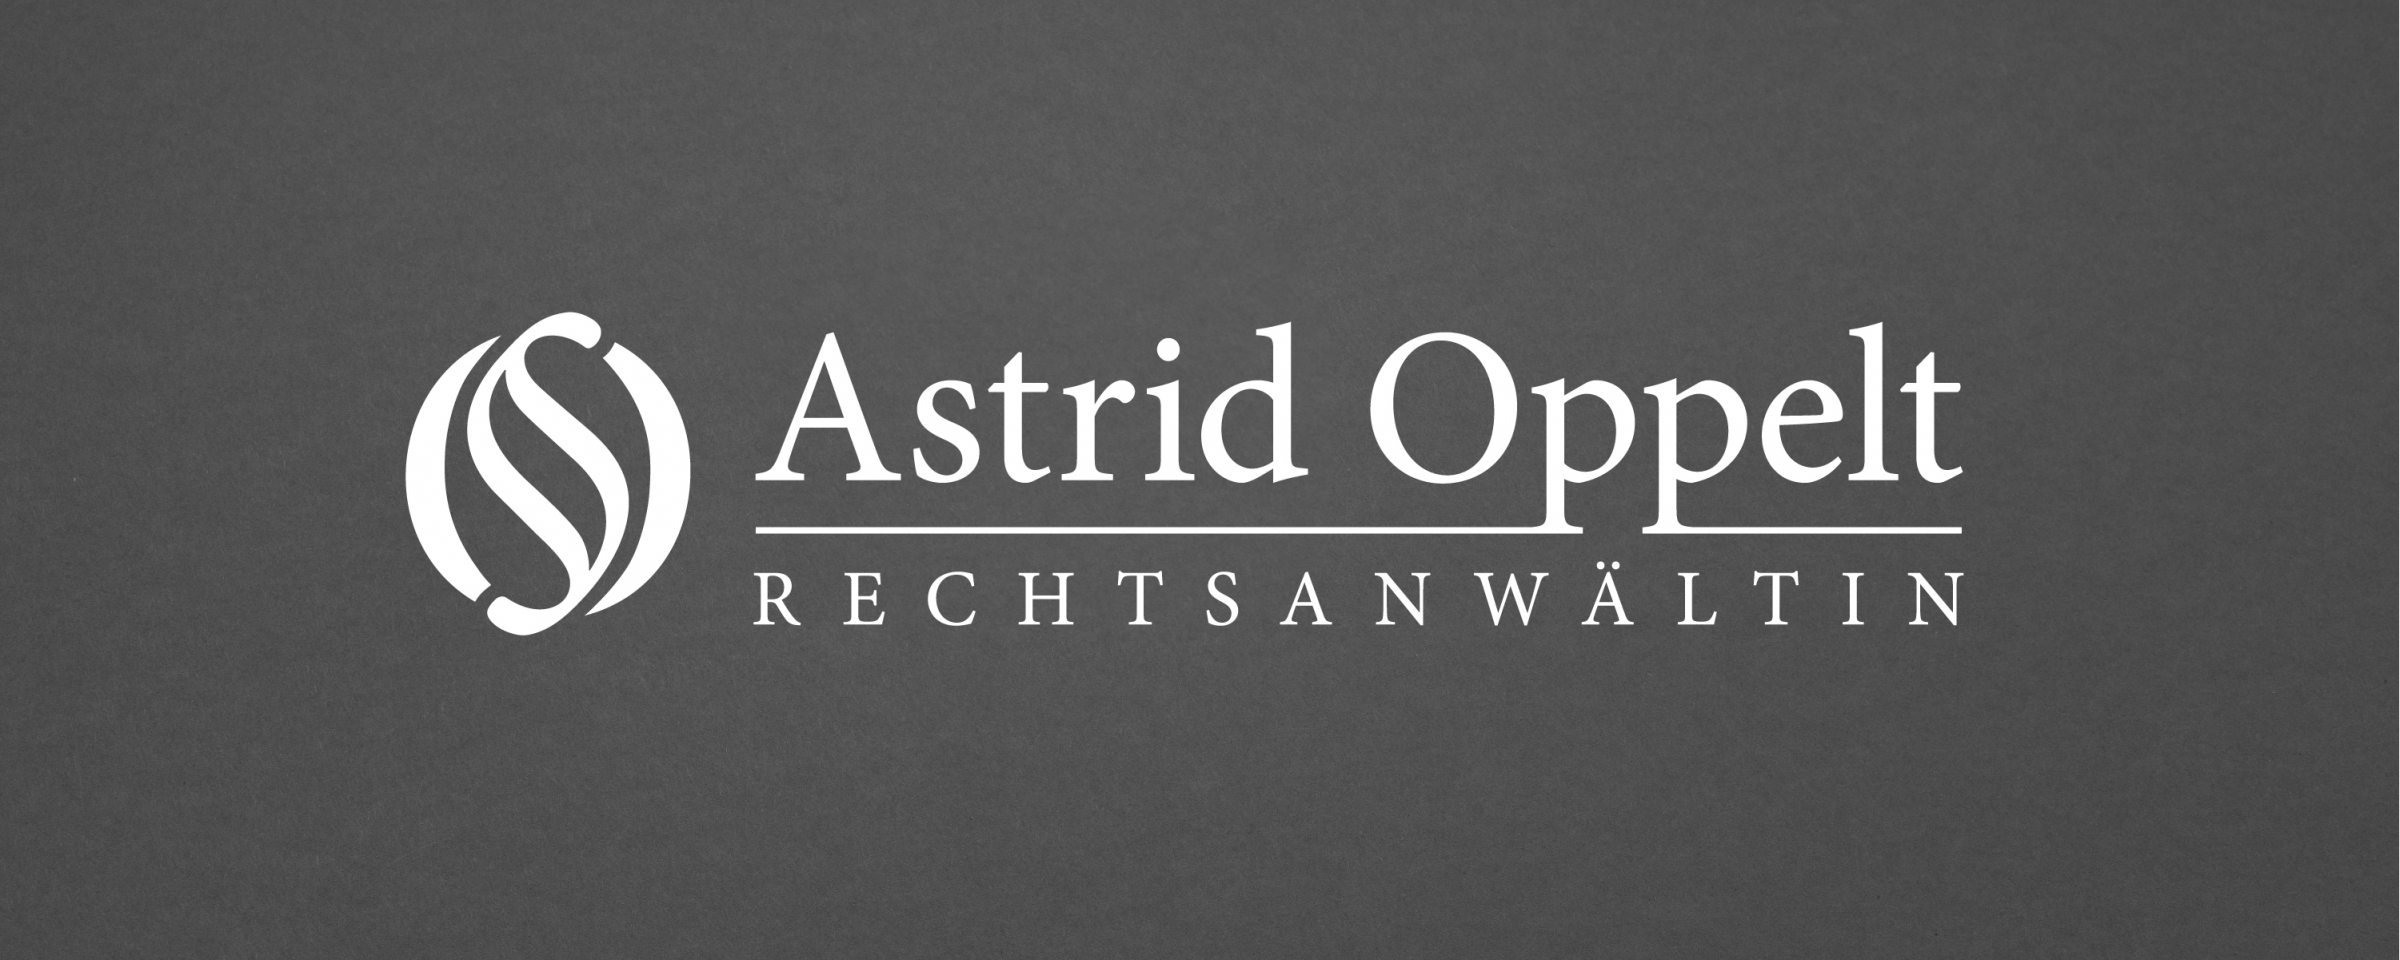 Logo Rechtsanwältin Astrid Oppelt